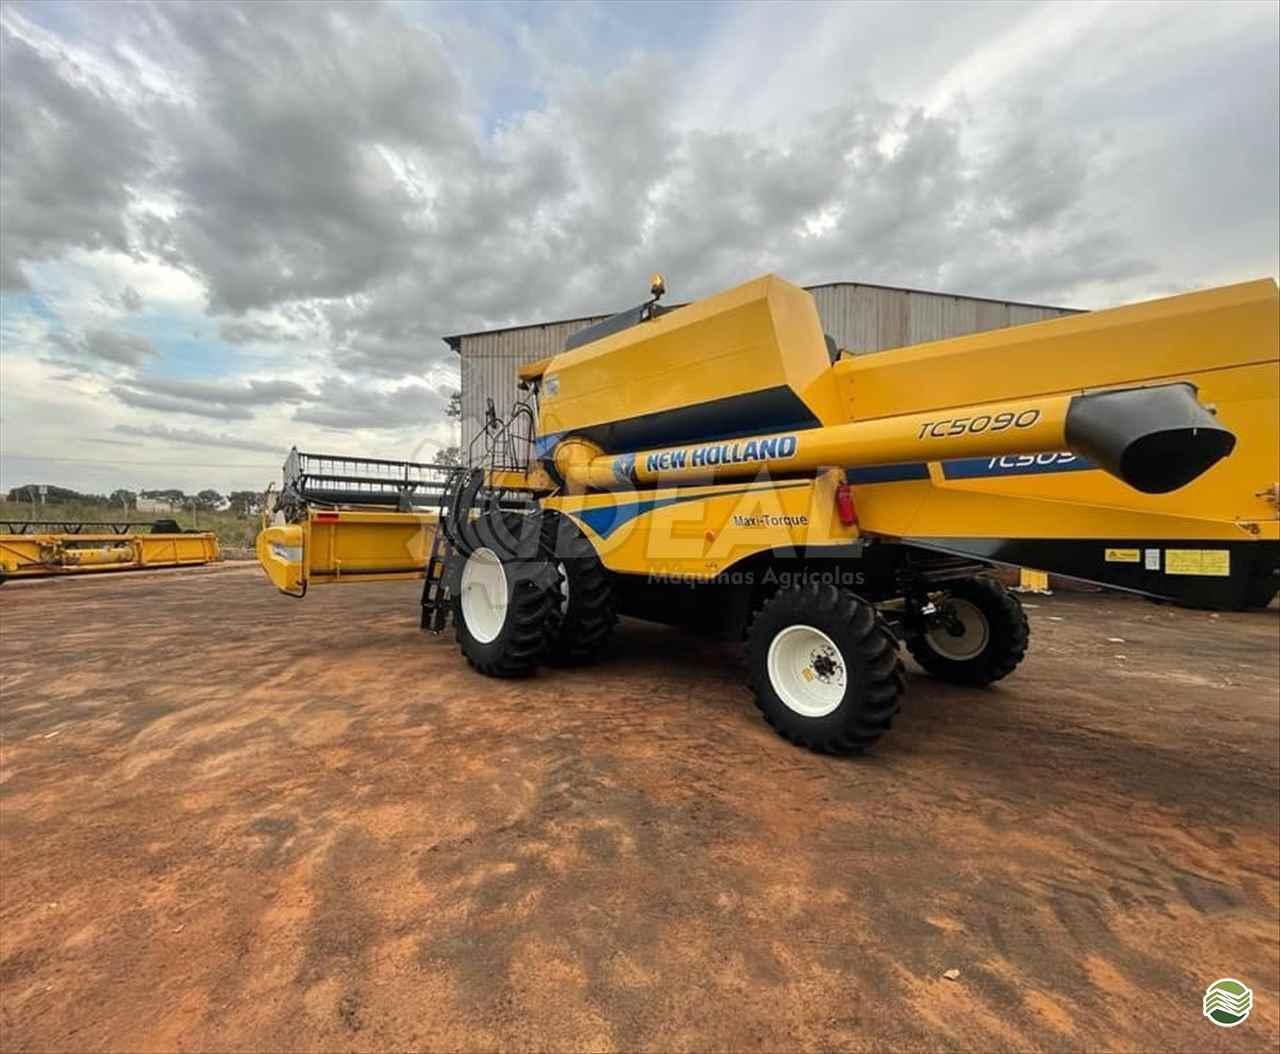 NEW HOLLAND TC 5090  2015/2016 Ideal Máquinas Agrícolas